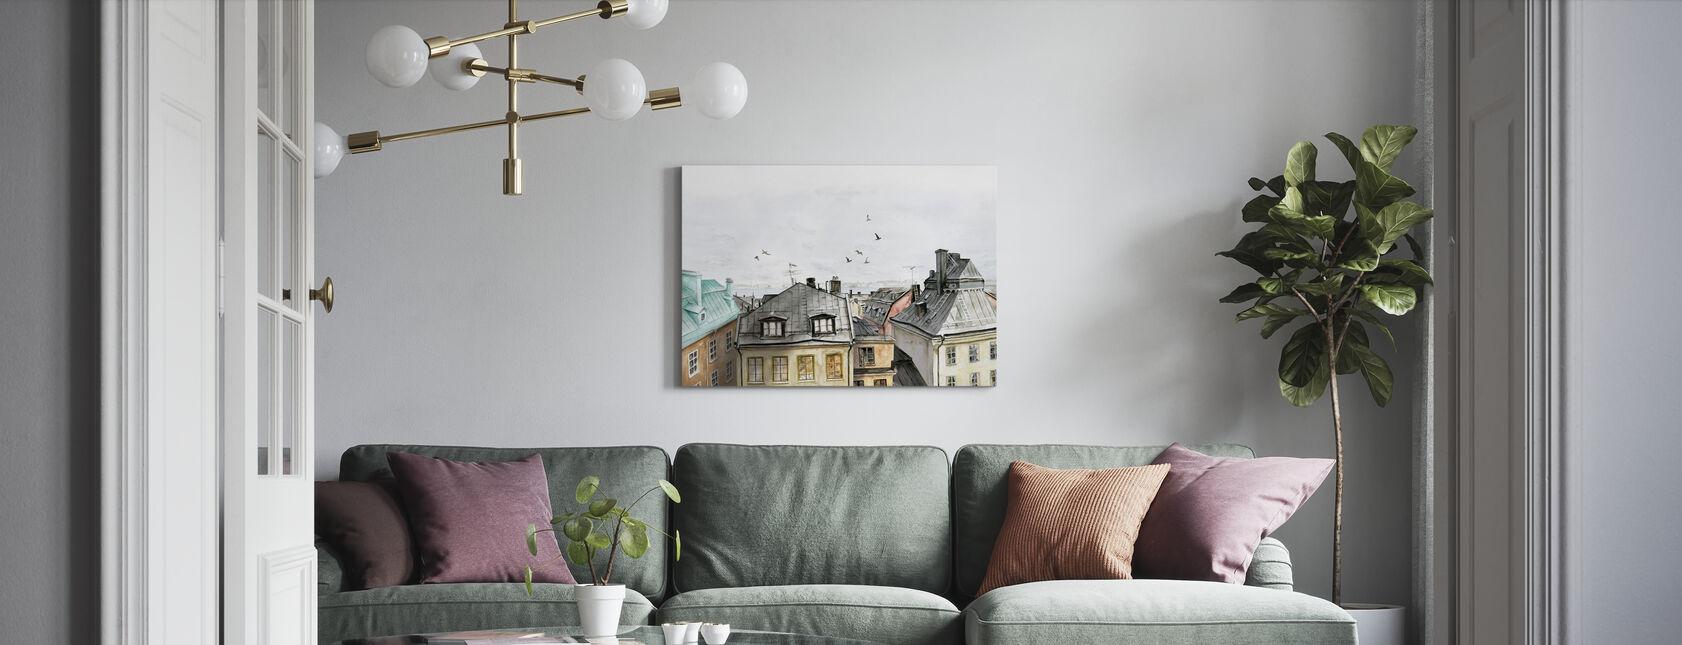 Rooftops II - Canvas print - Living Room